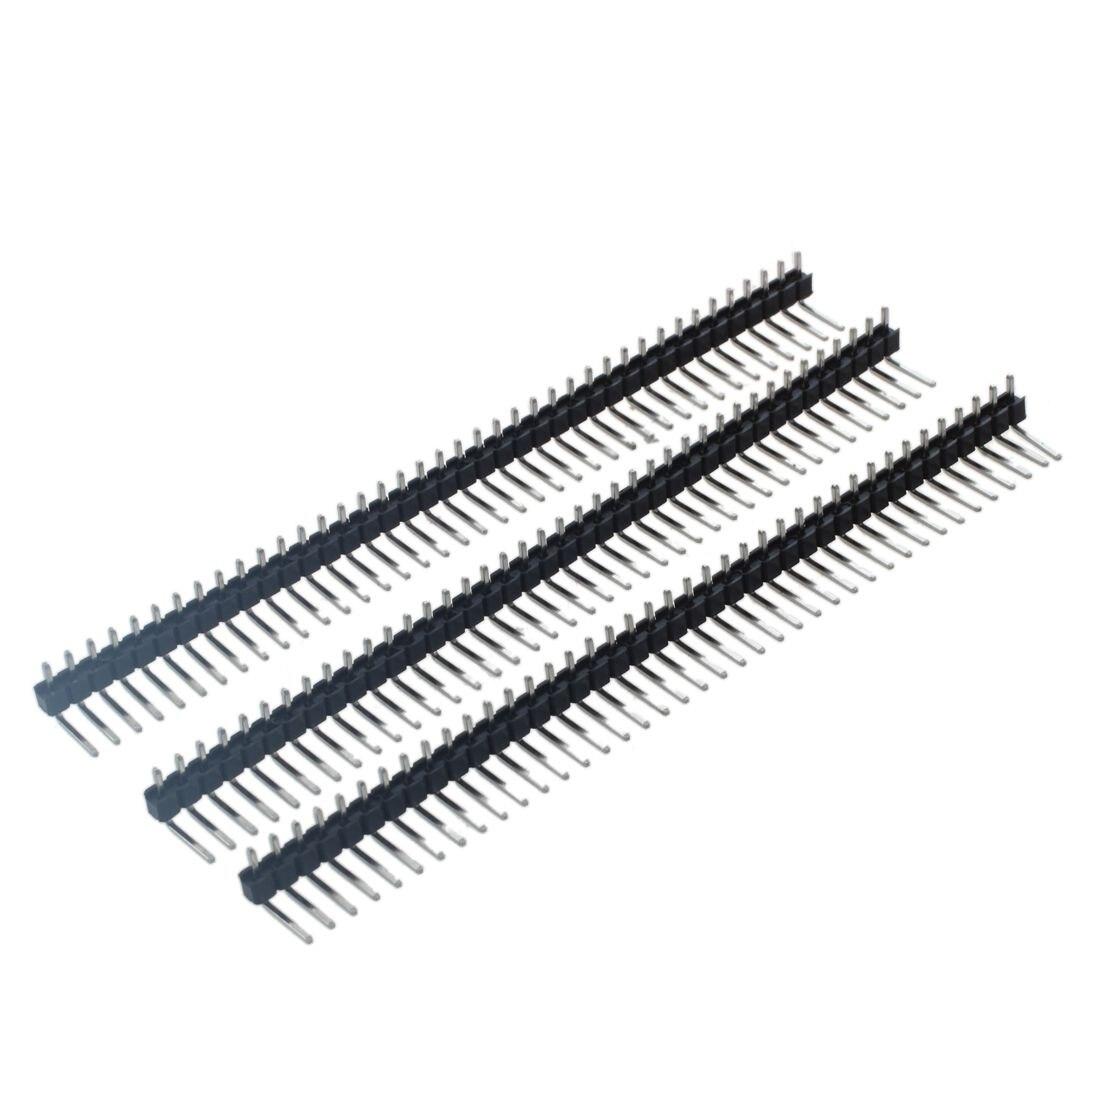 3 Pcs 40 Pins 2 54mm Pitch Single Row Right Angle Pcb